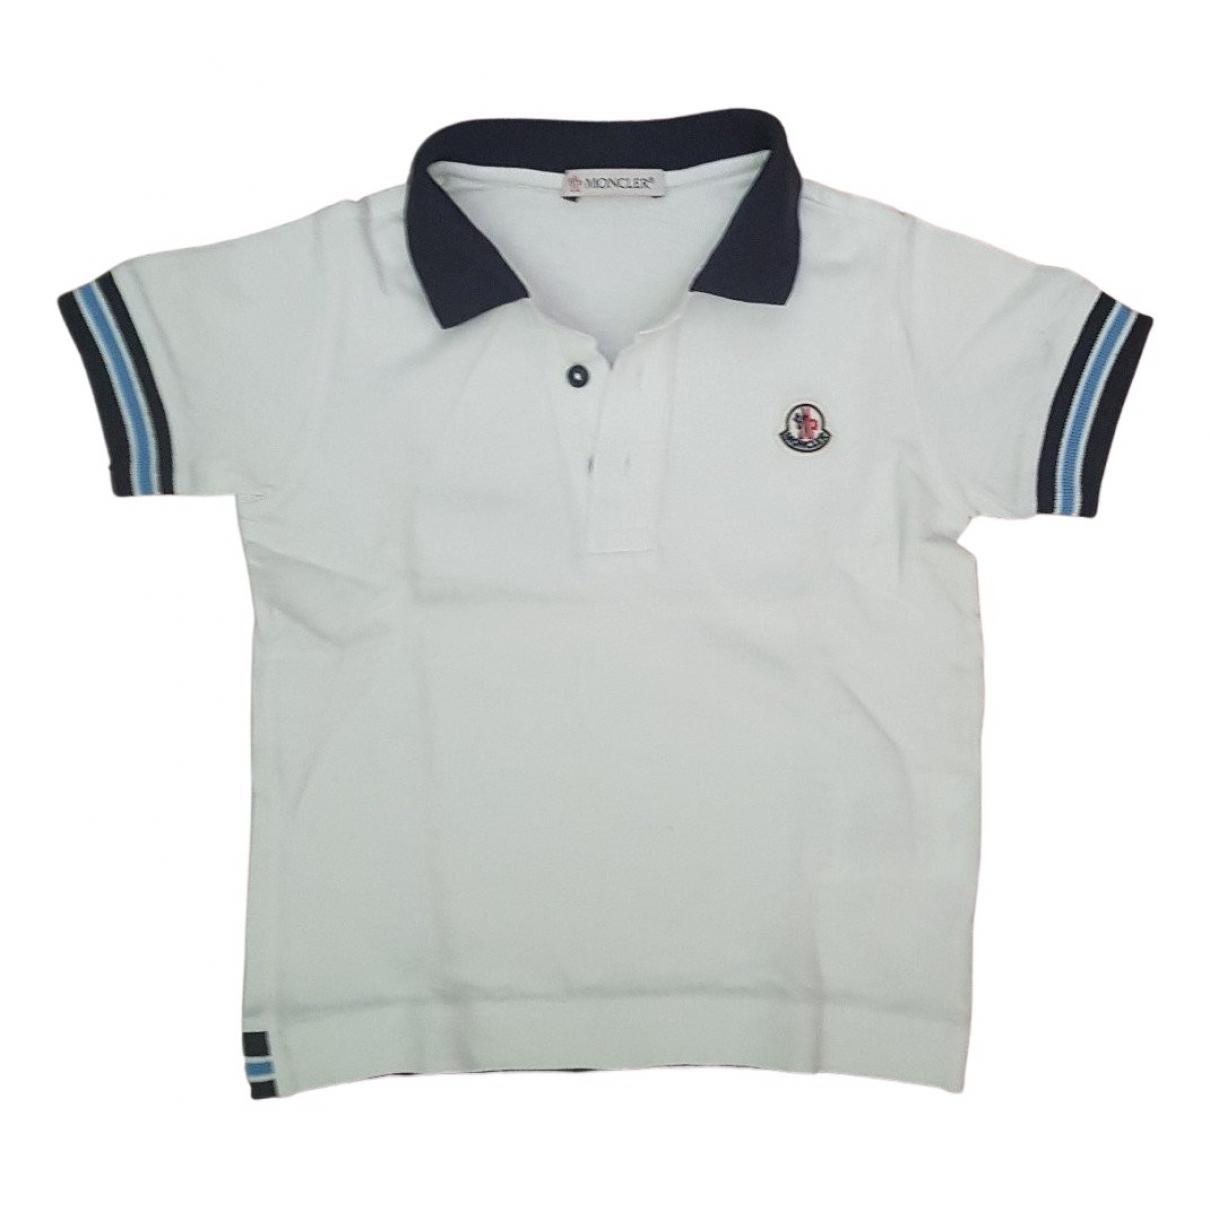 Camisetas en Algodon Blanco Moncler